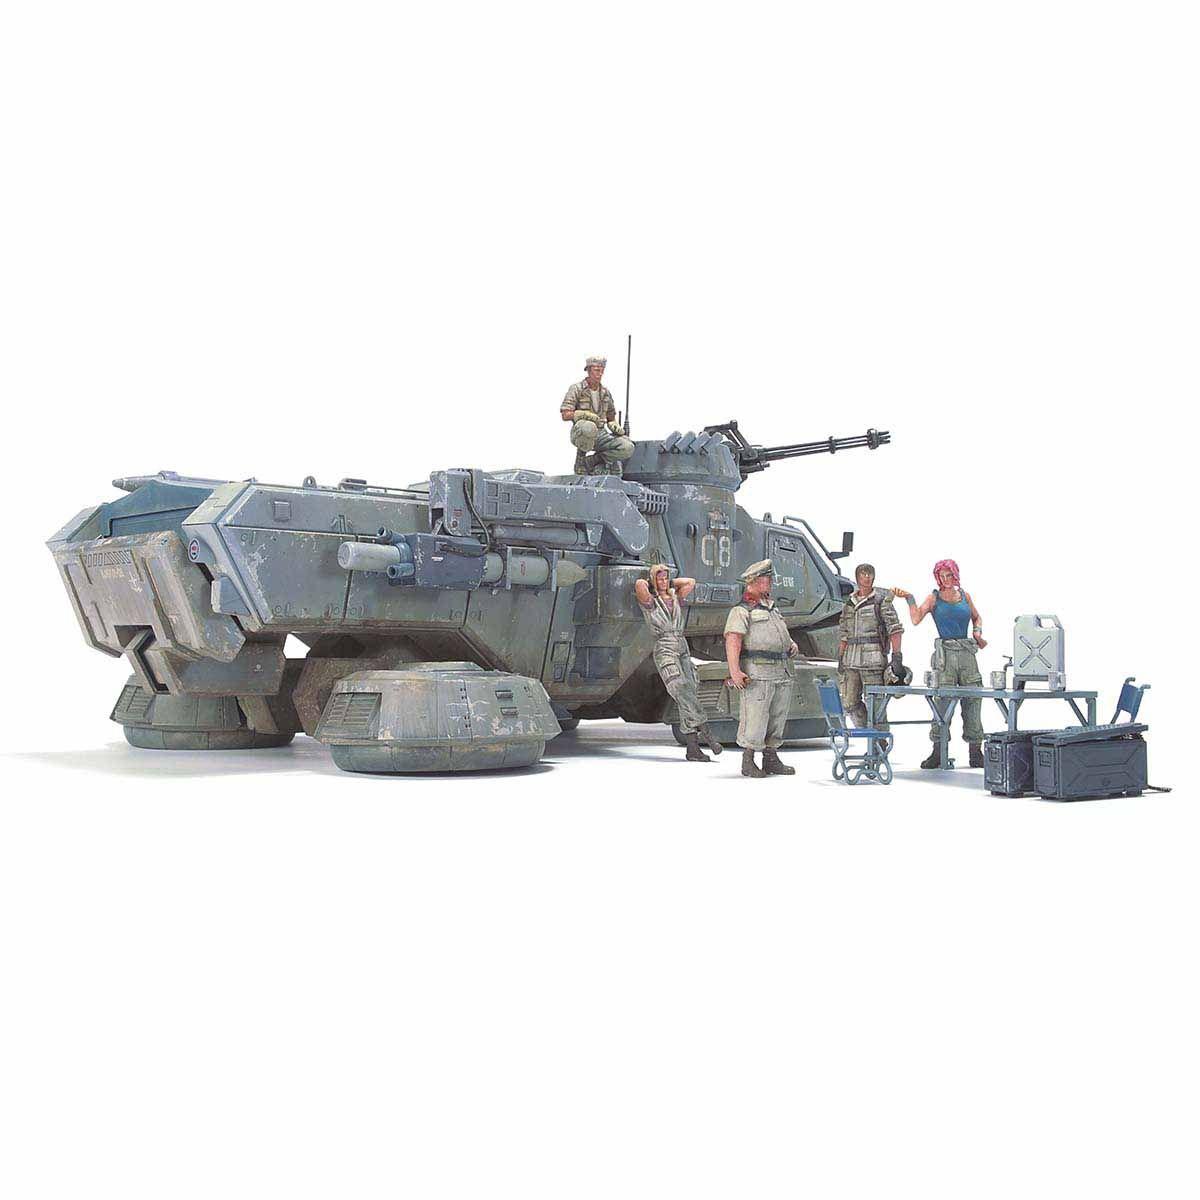 78399U.C.HARD GRAPH 003 1/35 地球連邦軍 陸戦MS小隊ブリーフィングセット